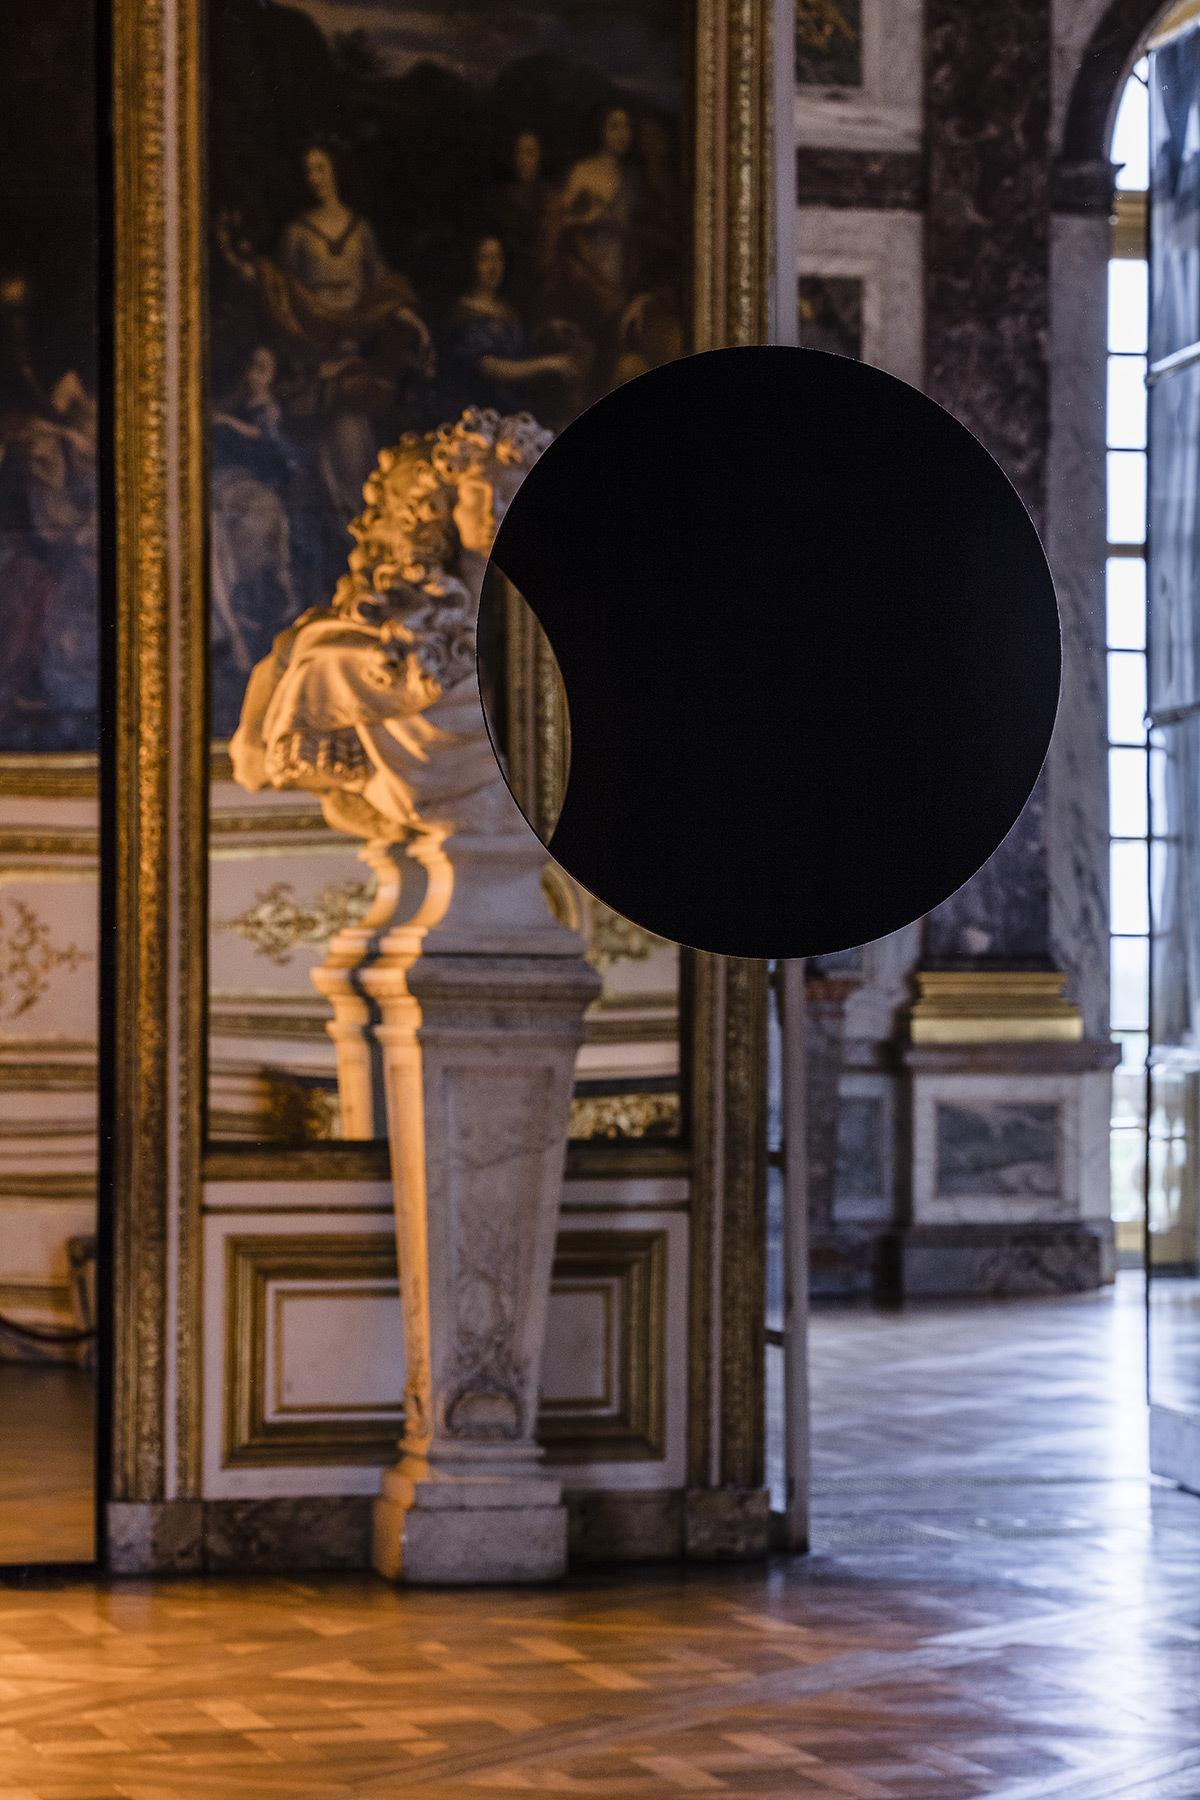 Olafur Eliasson, Deep mirror black, 2016 - Château de Versailles, France - Photo : Anders Sune Berg